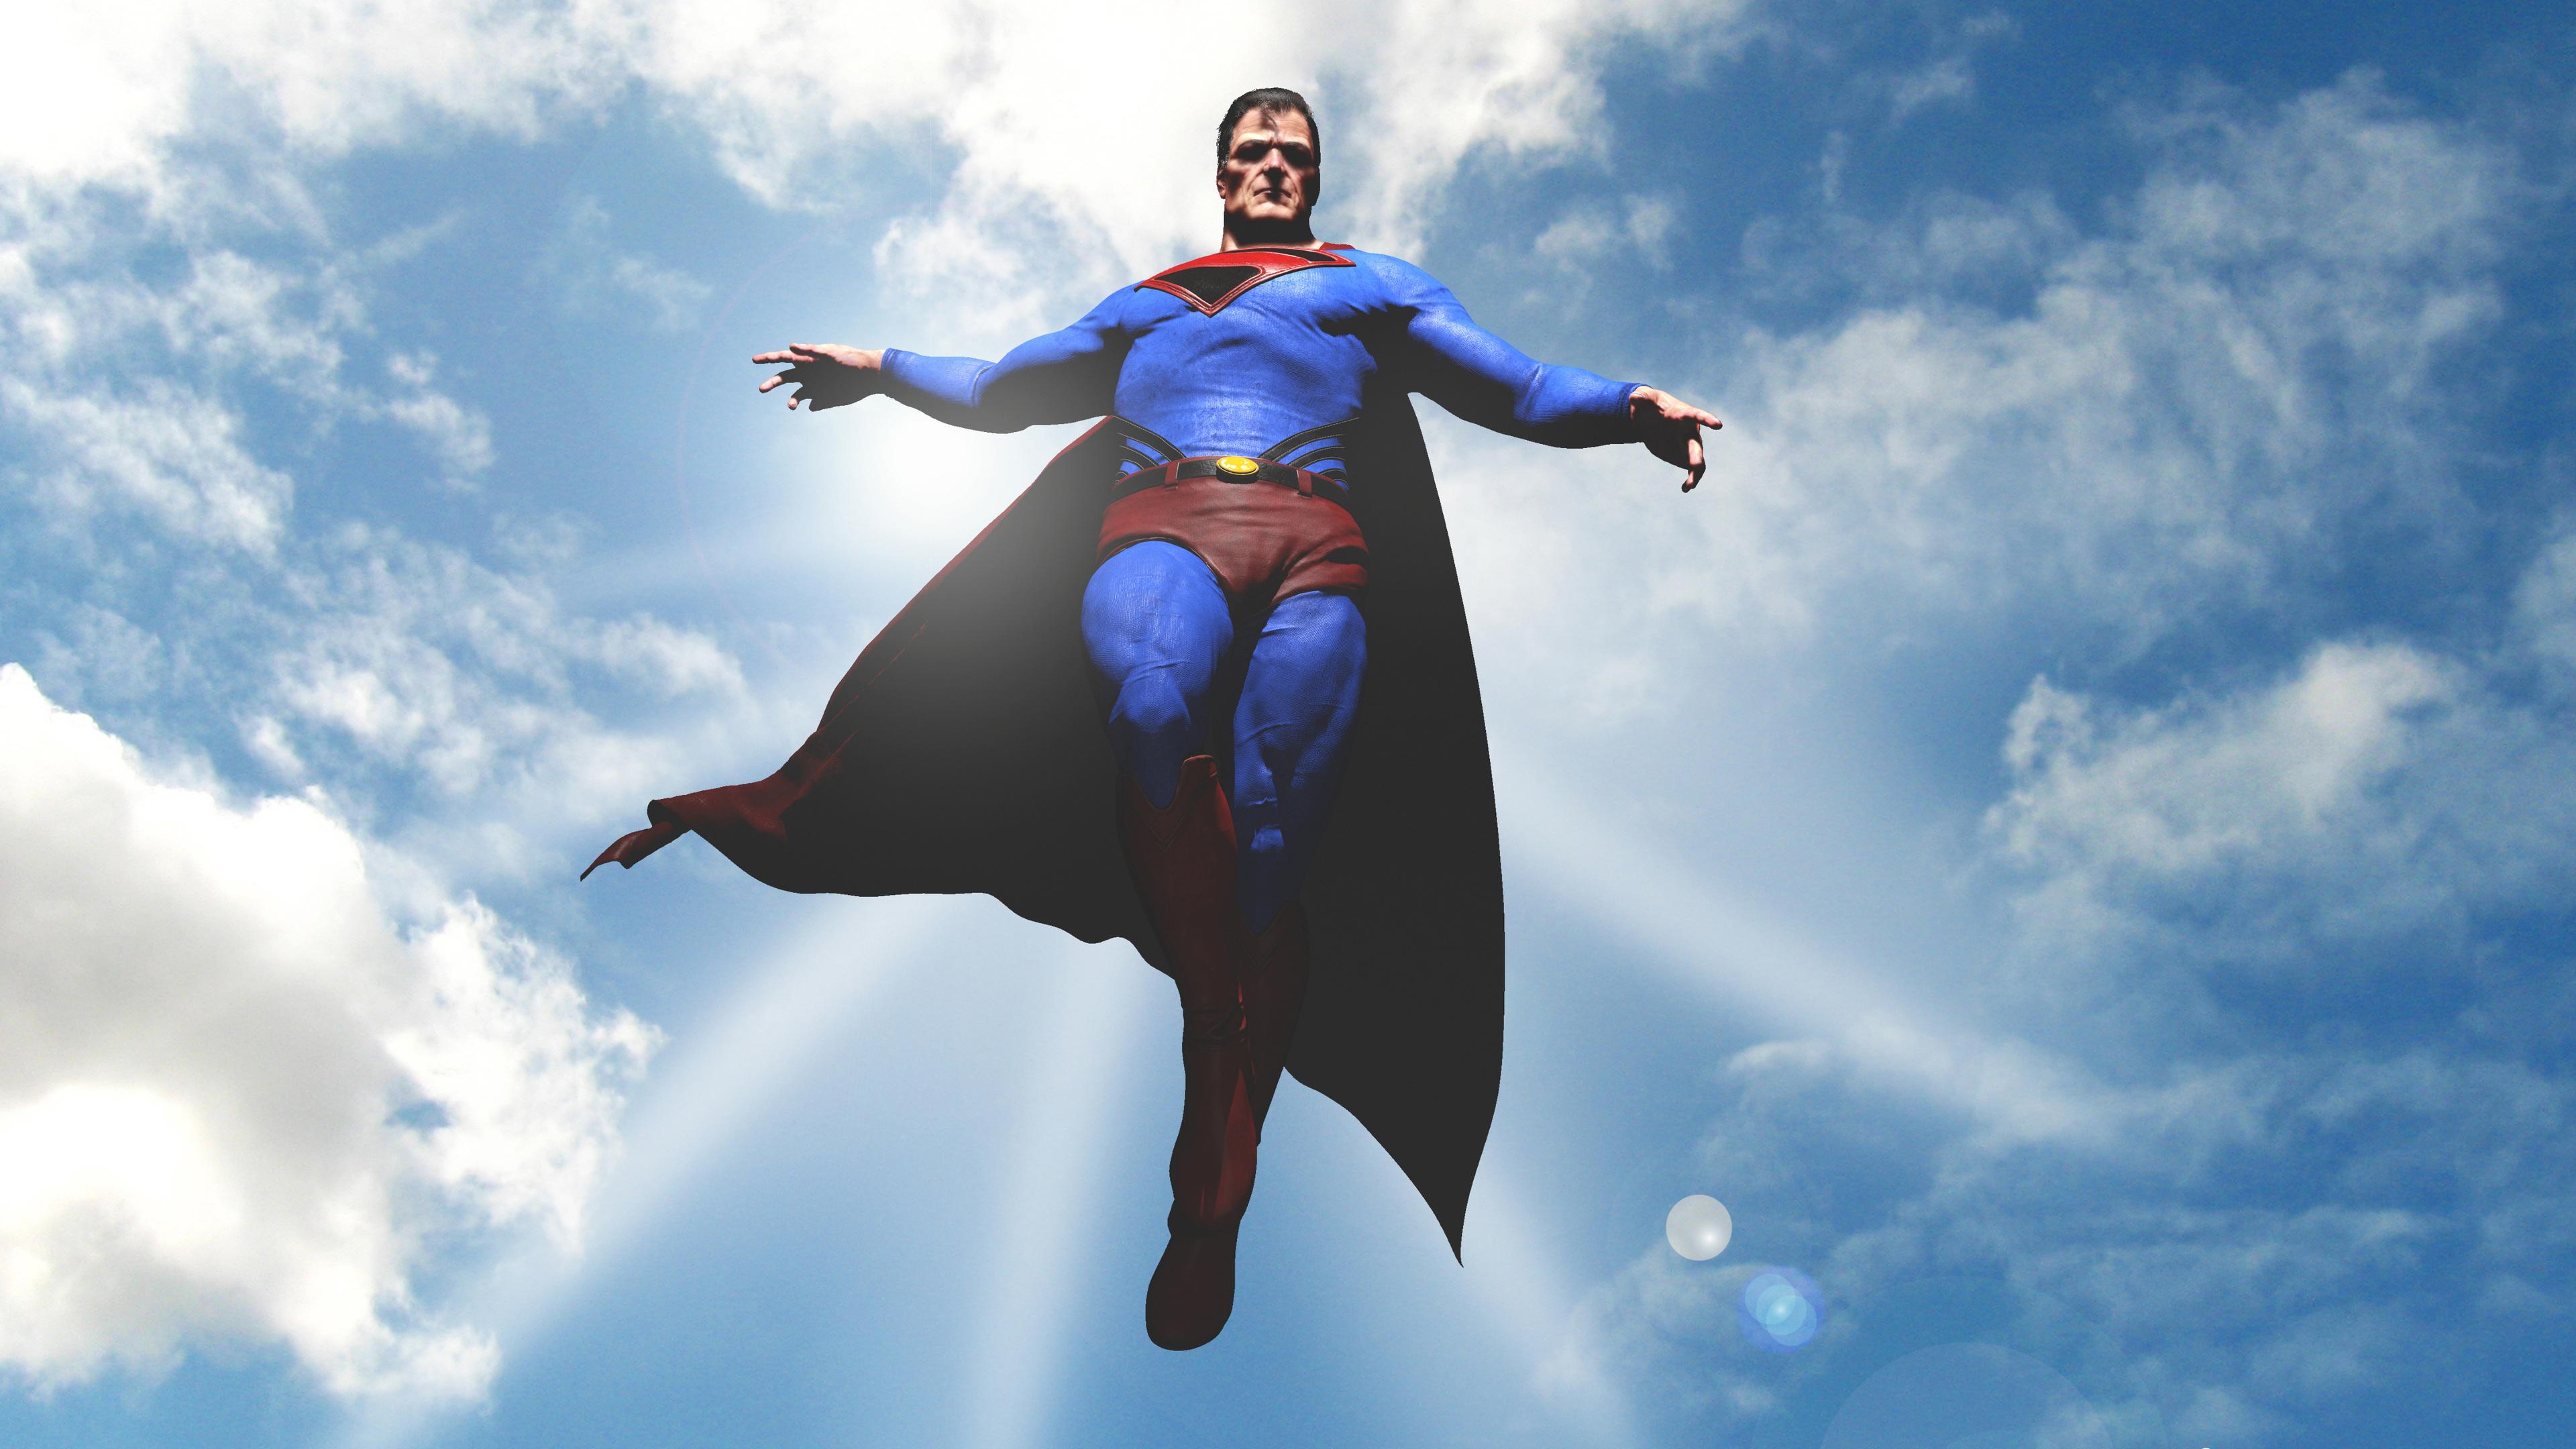 superman 5k art 1536523886 - Superman 5k Art - superman wallpapers, superheroes wallpapers, hd-wallpapers, digital art wallpapers, deviantart wallpapers, artwork wallpapers, artist wallpapers, 5k wallpapers, 4k-wallpapers